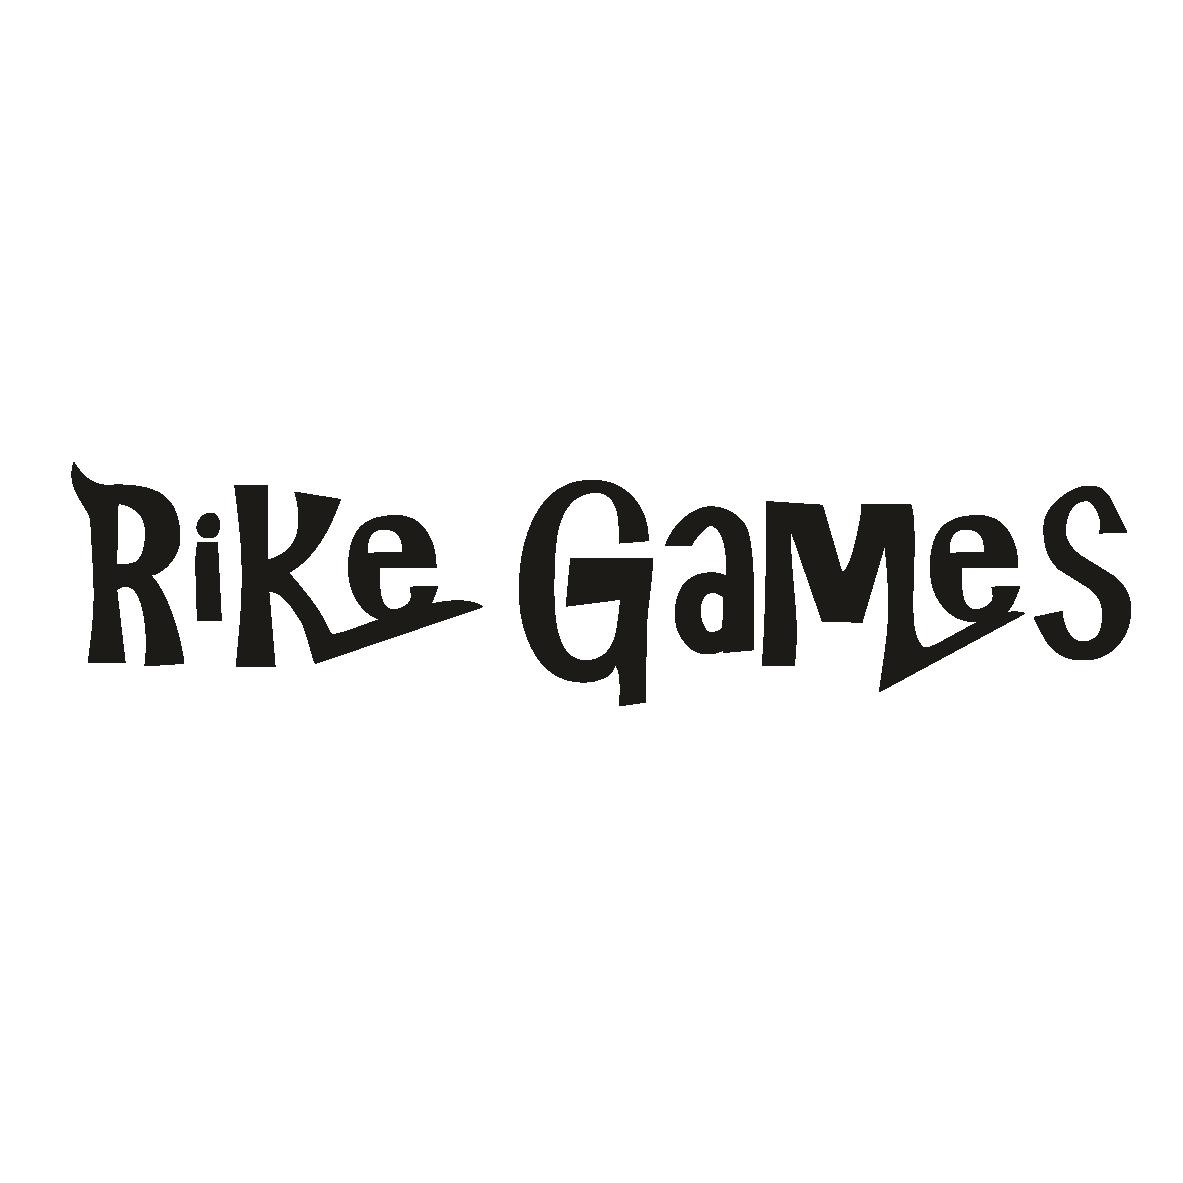 Rike Games